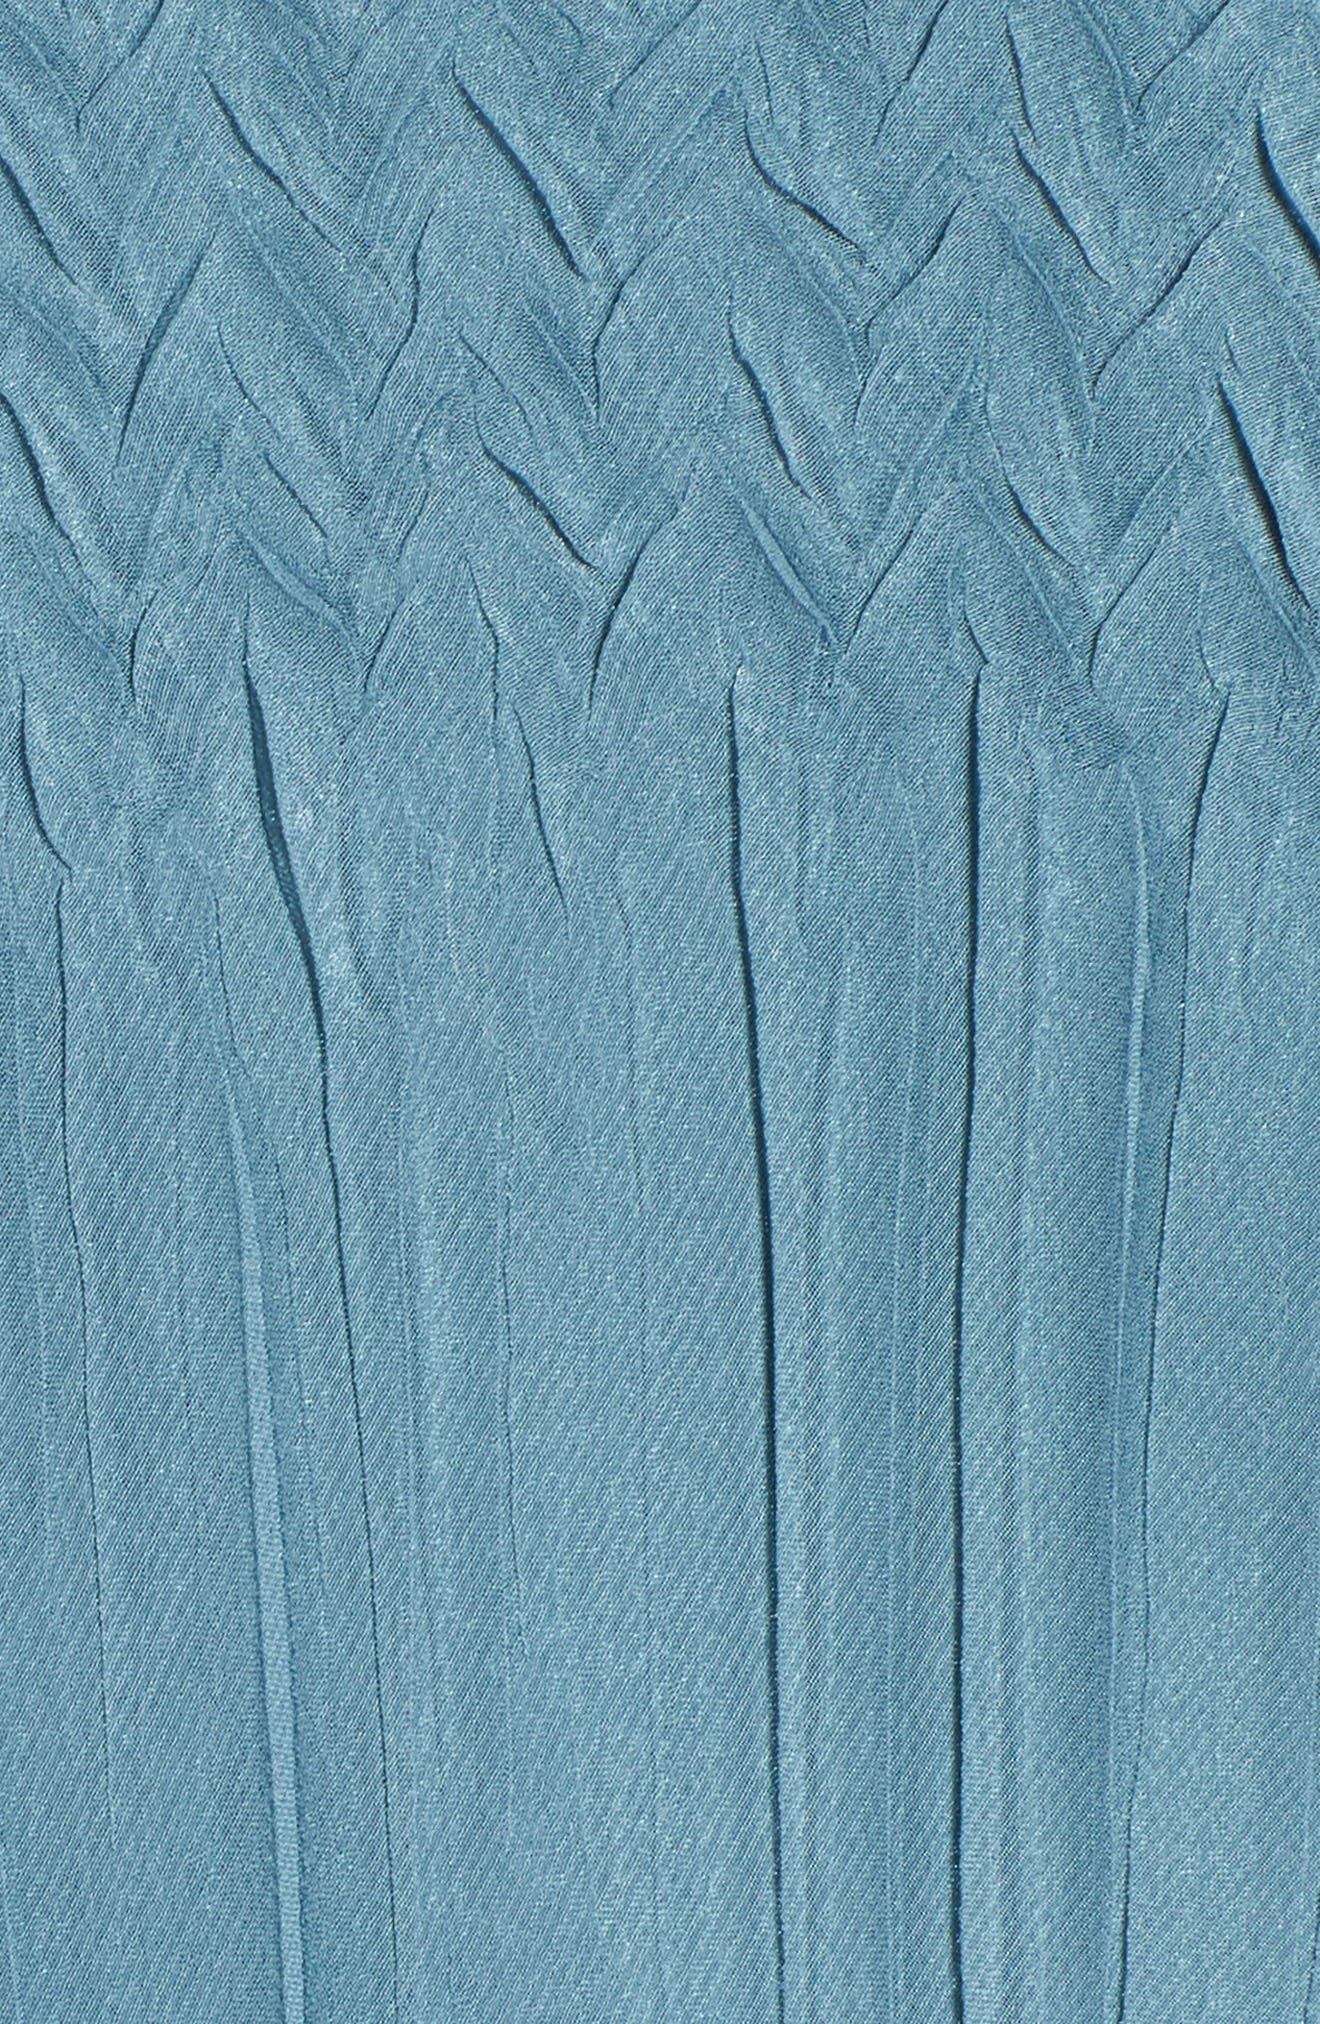 Bead Trim Tiered Chiffon Dress,                             Alternate thumbnail 5, color,                             405